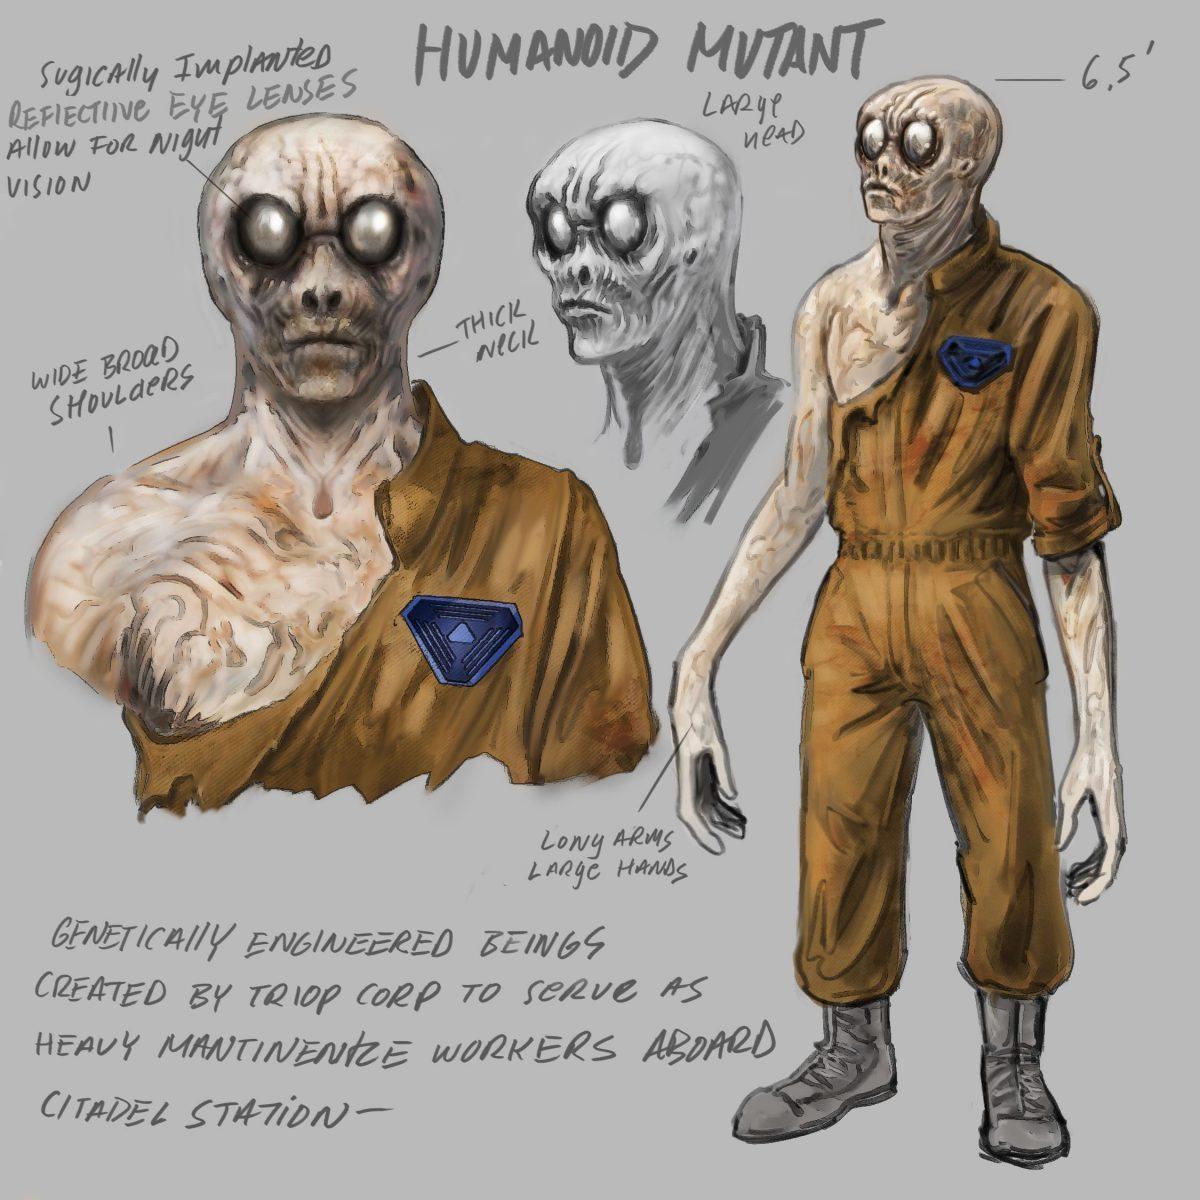 humanoid_mutant_concept_sheet.0